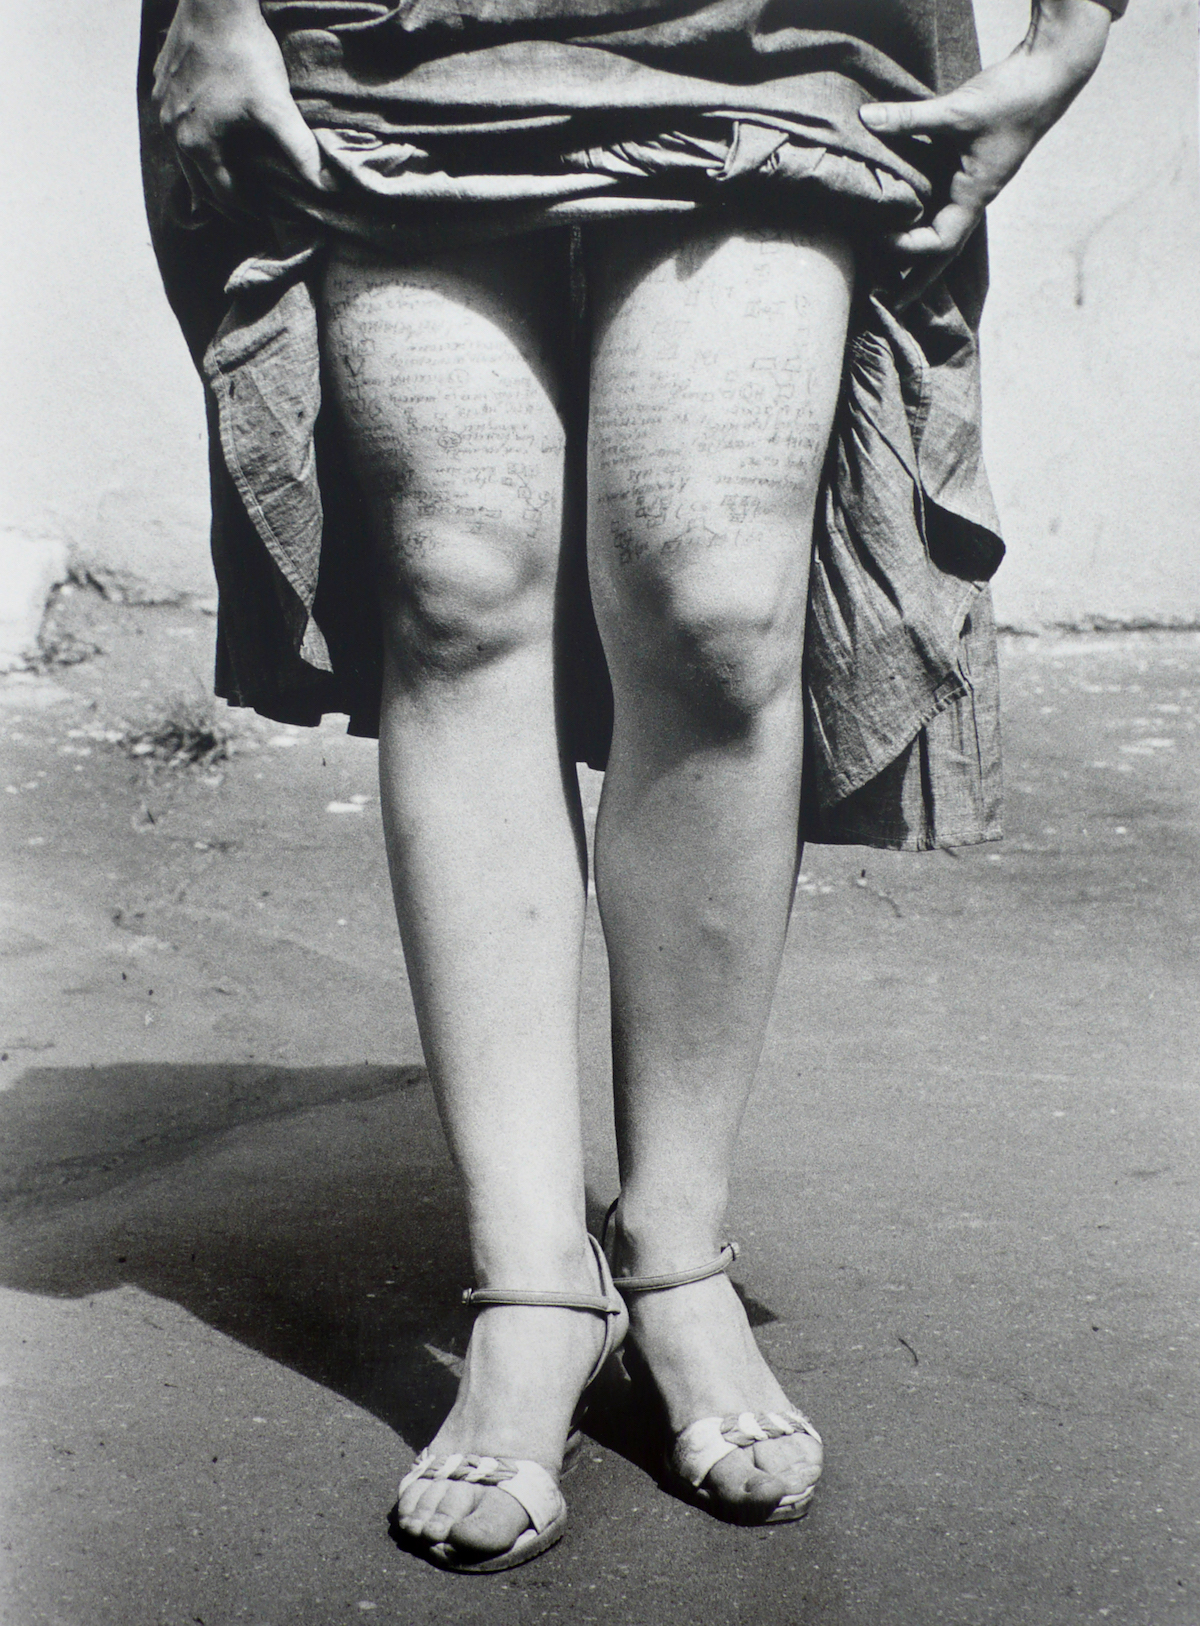 Michael Hoppen evidential photography show